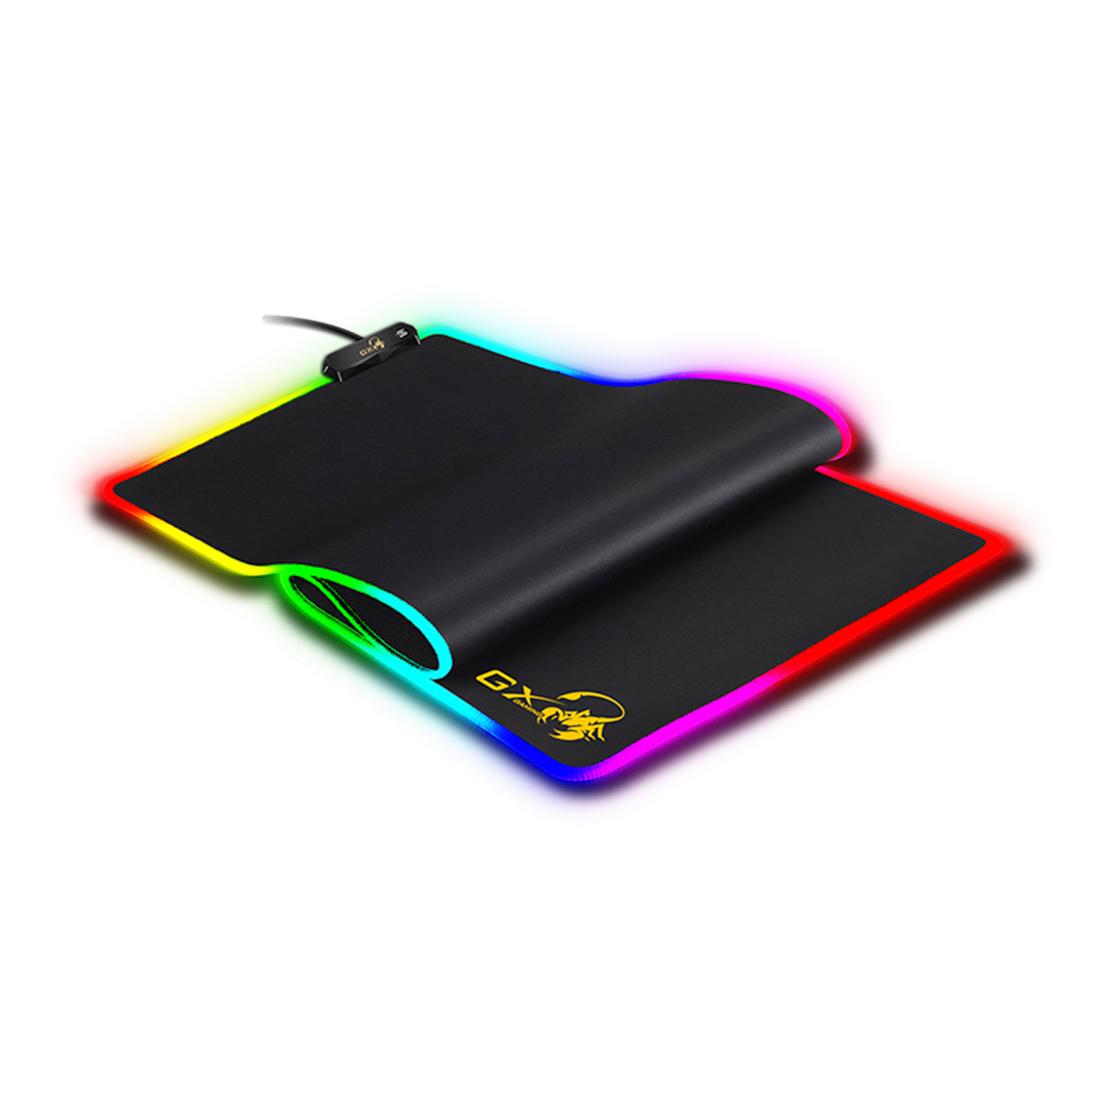 Коврик для компьютерной мыши Genius GX-Pad 800S RGB